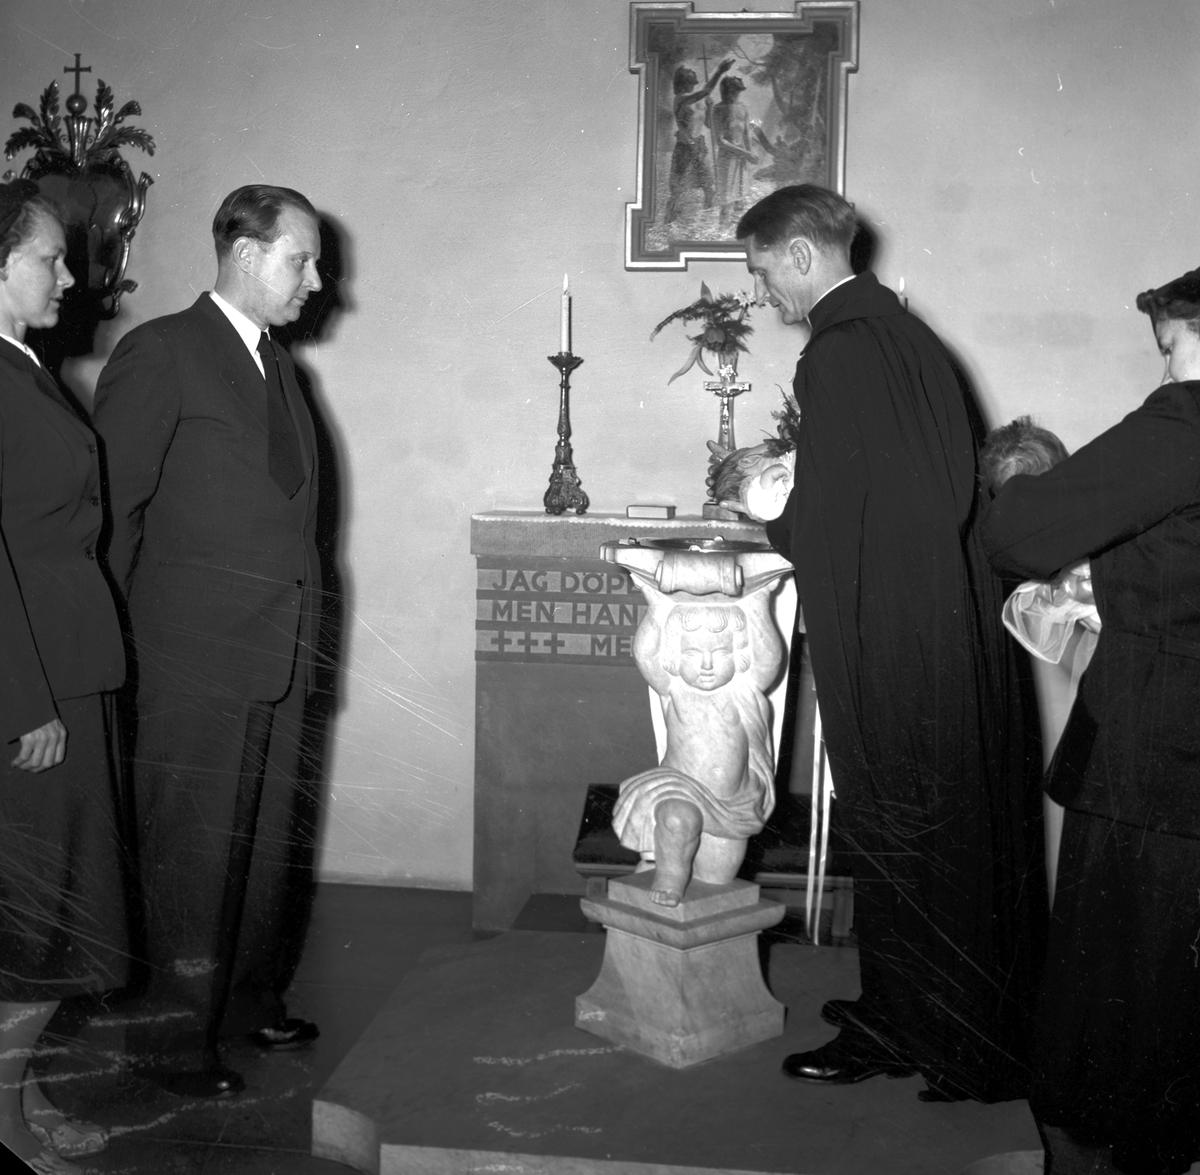 Barndop. Januari 1954. Harry Karlsten.